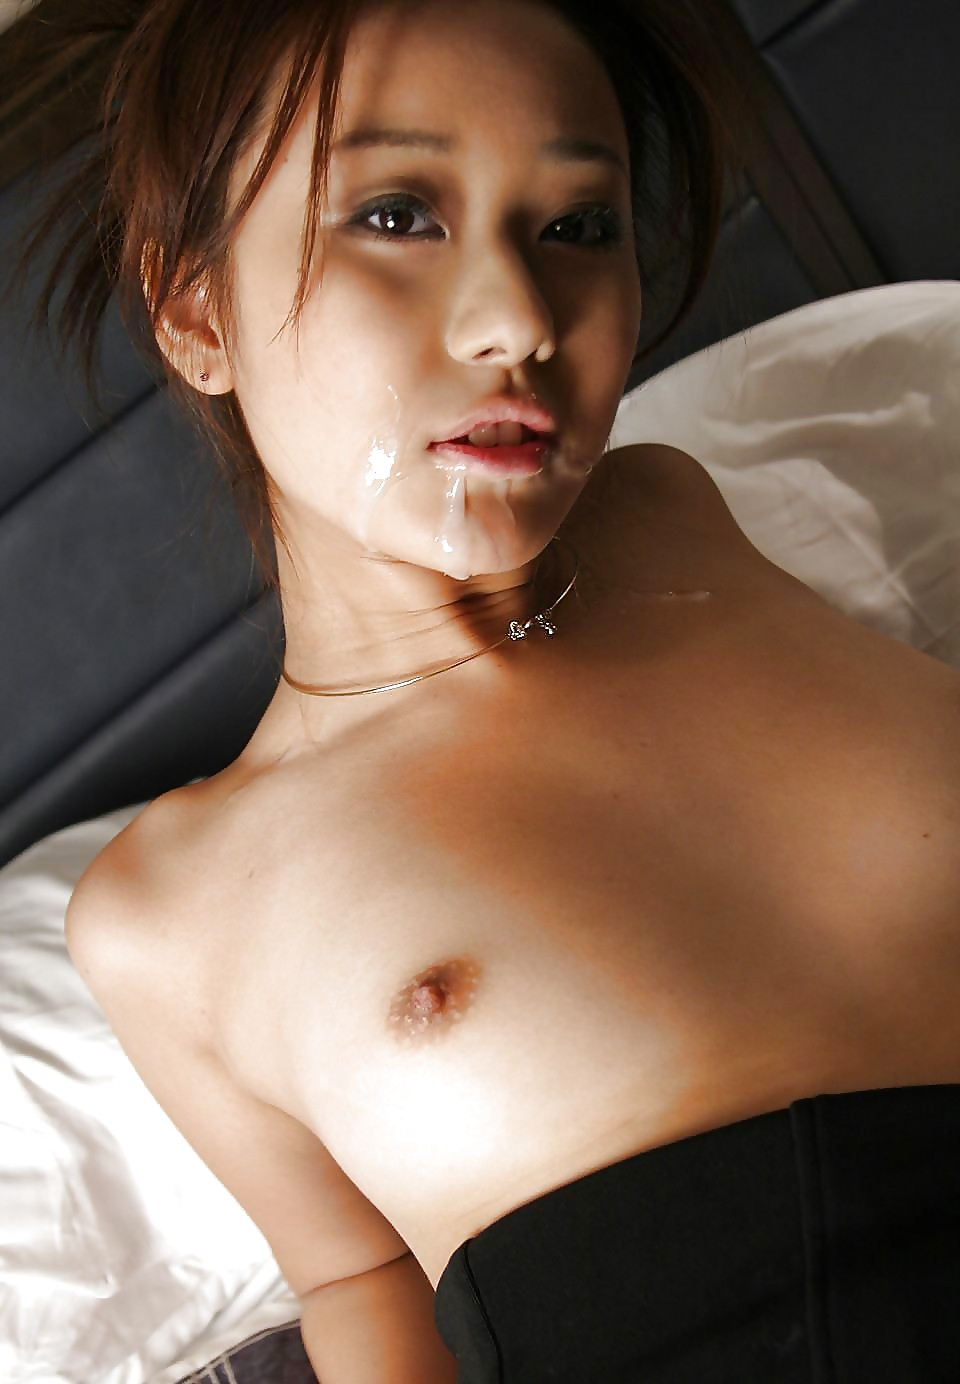 Mcgowen wet japanese girl cums michelle thomas